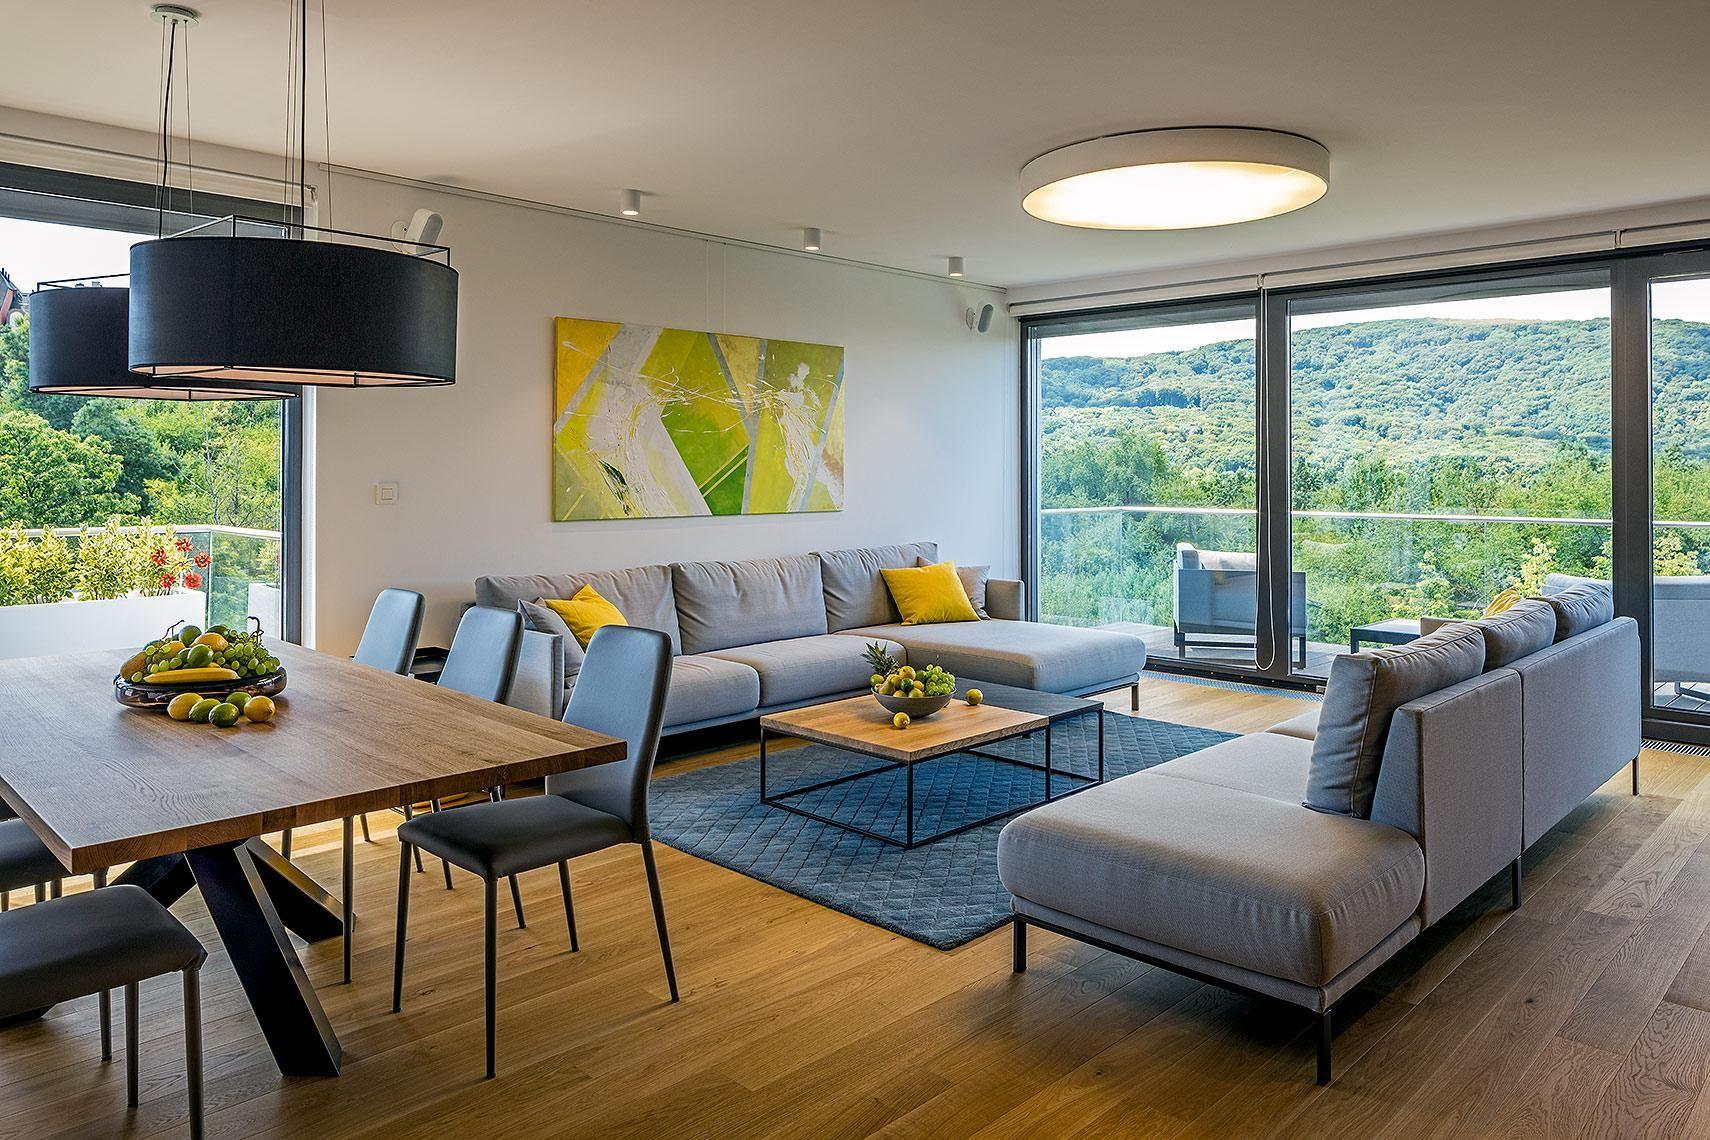 Veľkometrážny byt, Villa Vista, Bratislava | RULES architekti